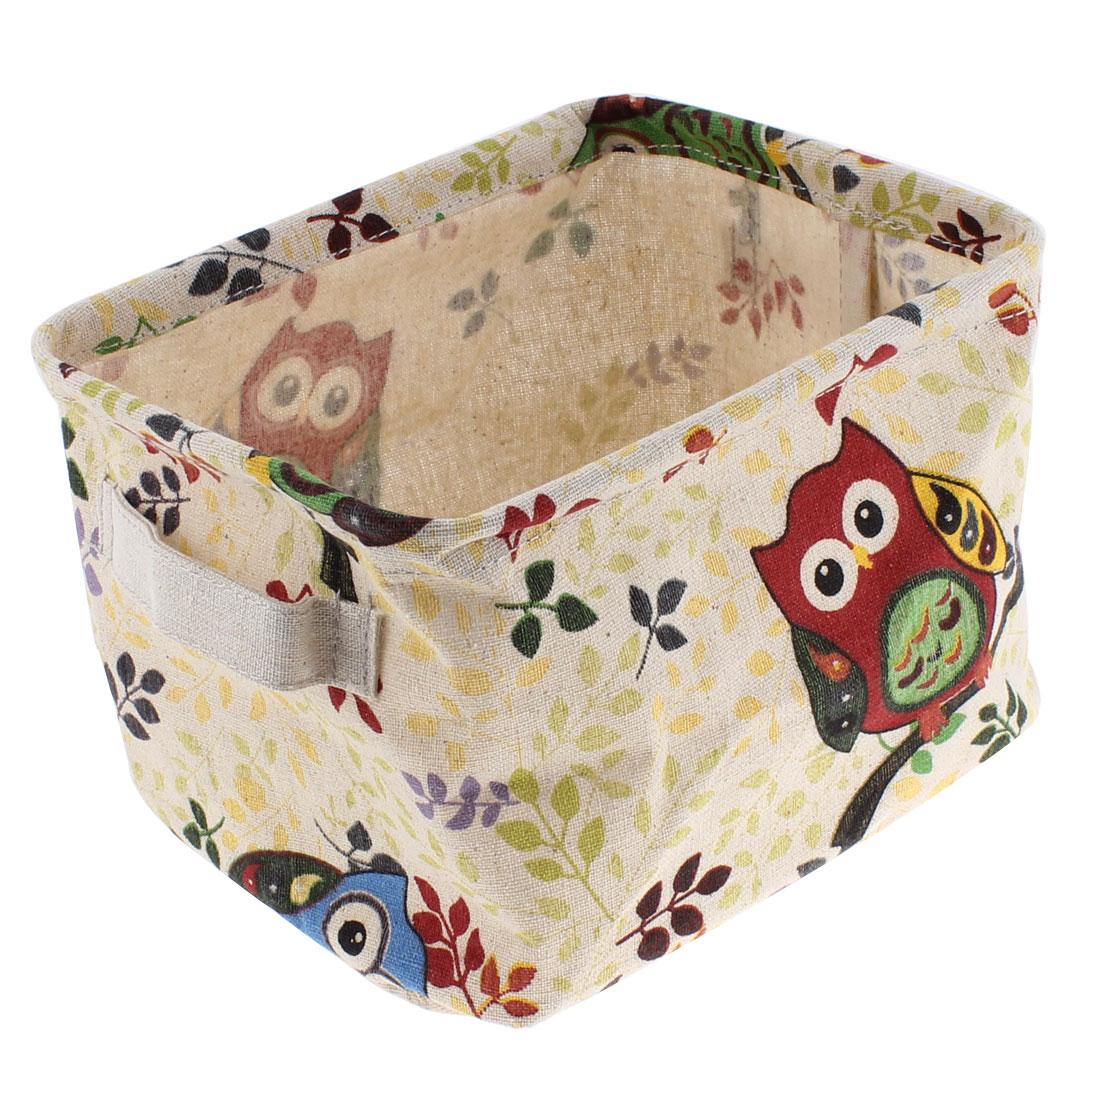 Metal Frame Owl Leaf Pattern Rectangle Shaped Storage Basket Bucket Container